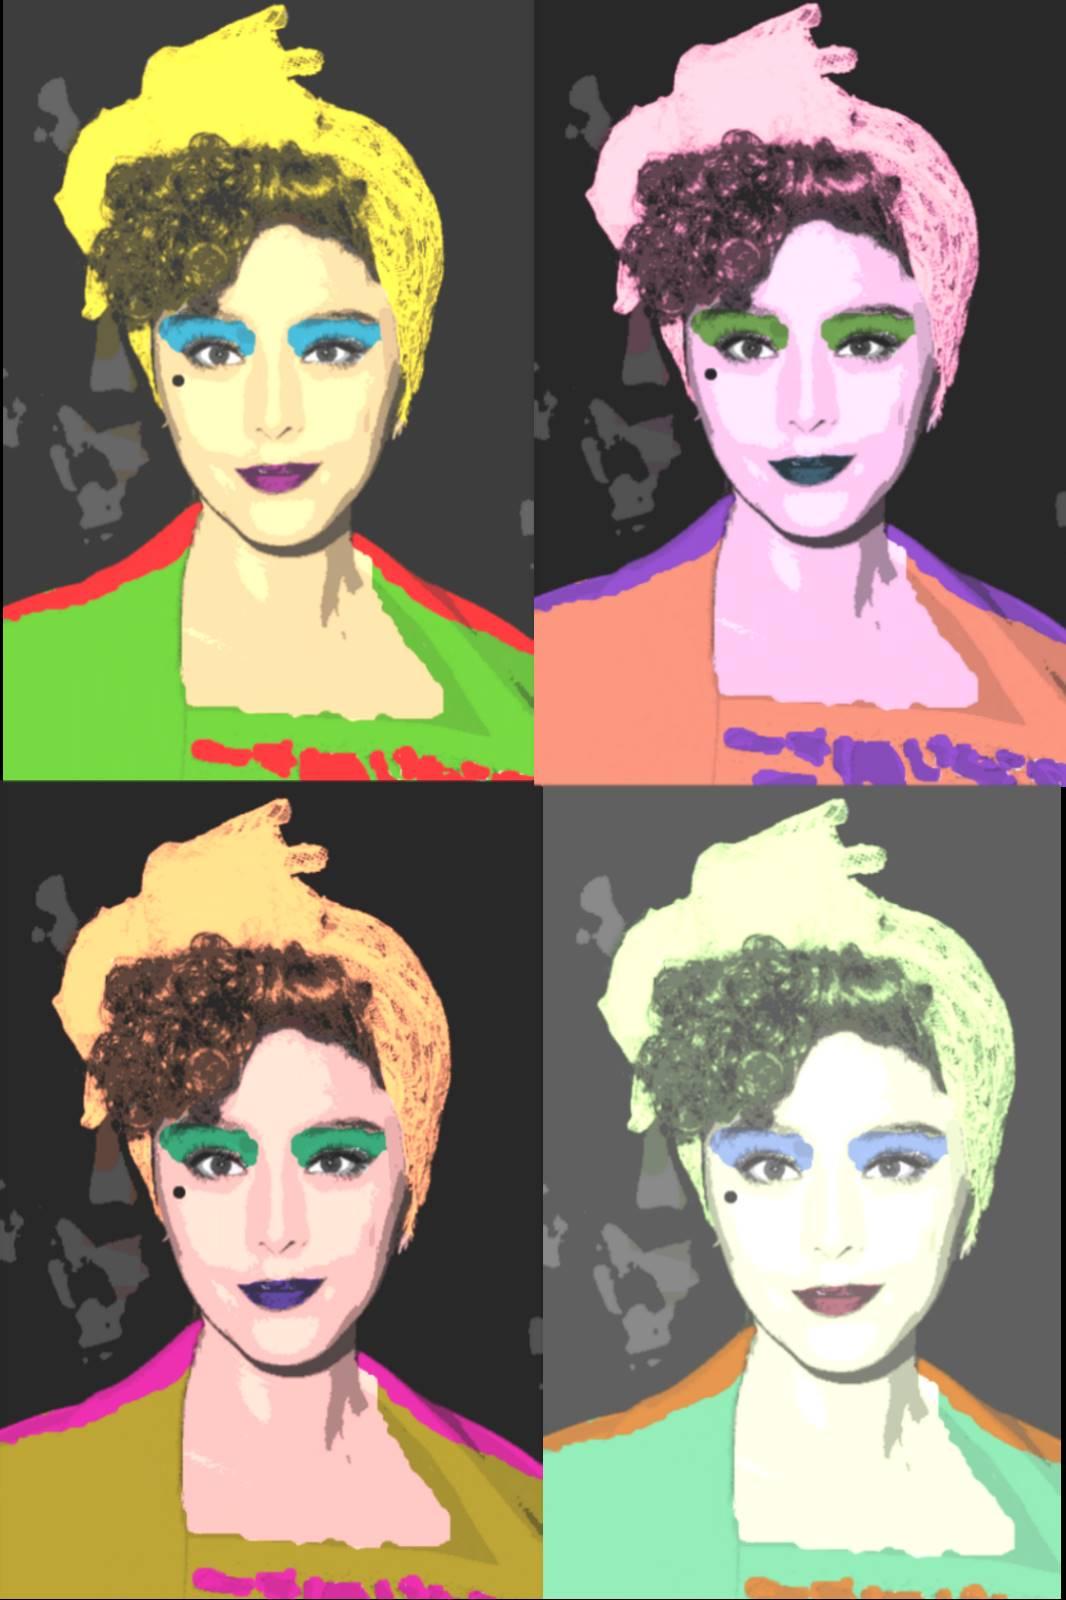 Computer-Art-Warhol-Style